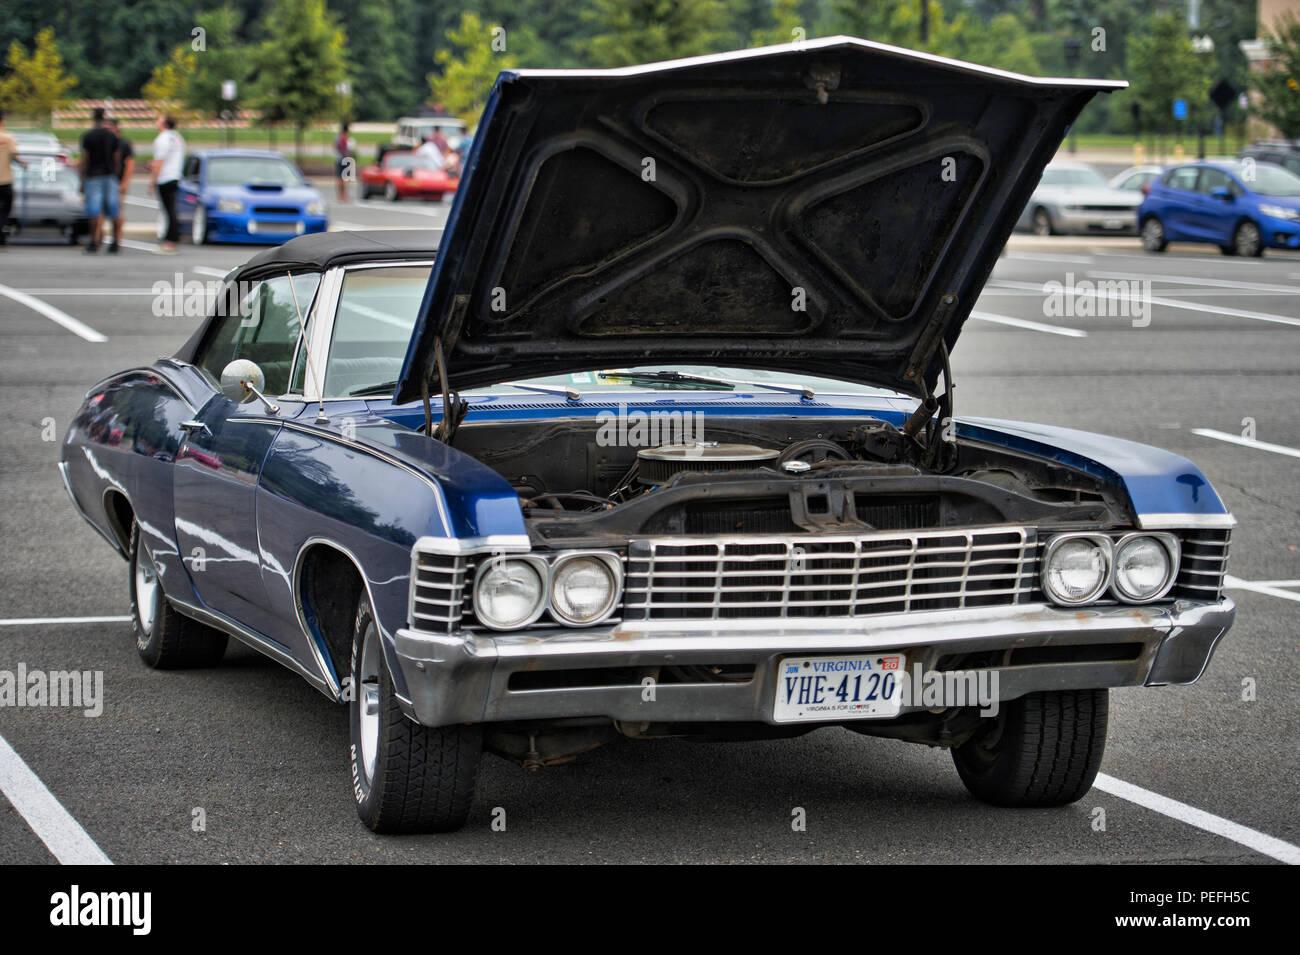 Chevrolet Impala Convertible Fotos E Imagenes De Stock Alamy